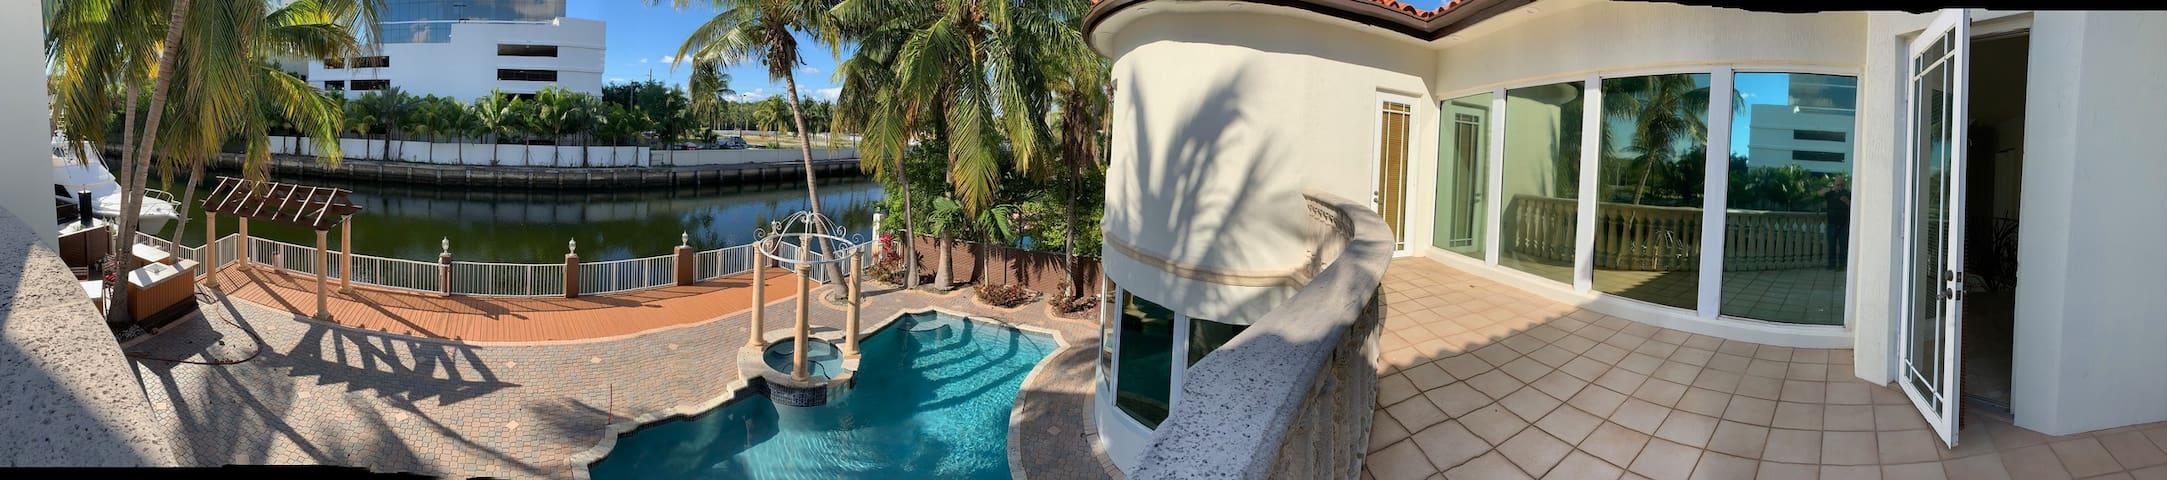 House  Villa Ocean Access,Pool  6 Bed 5 1/2 Baths